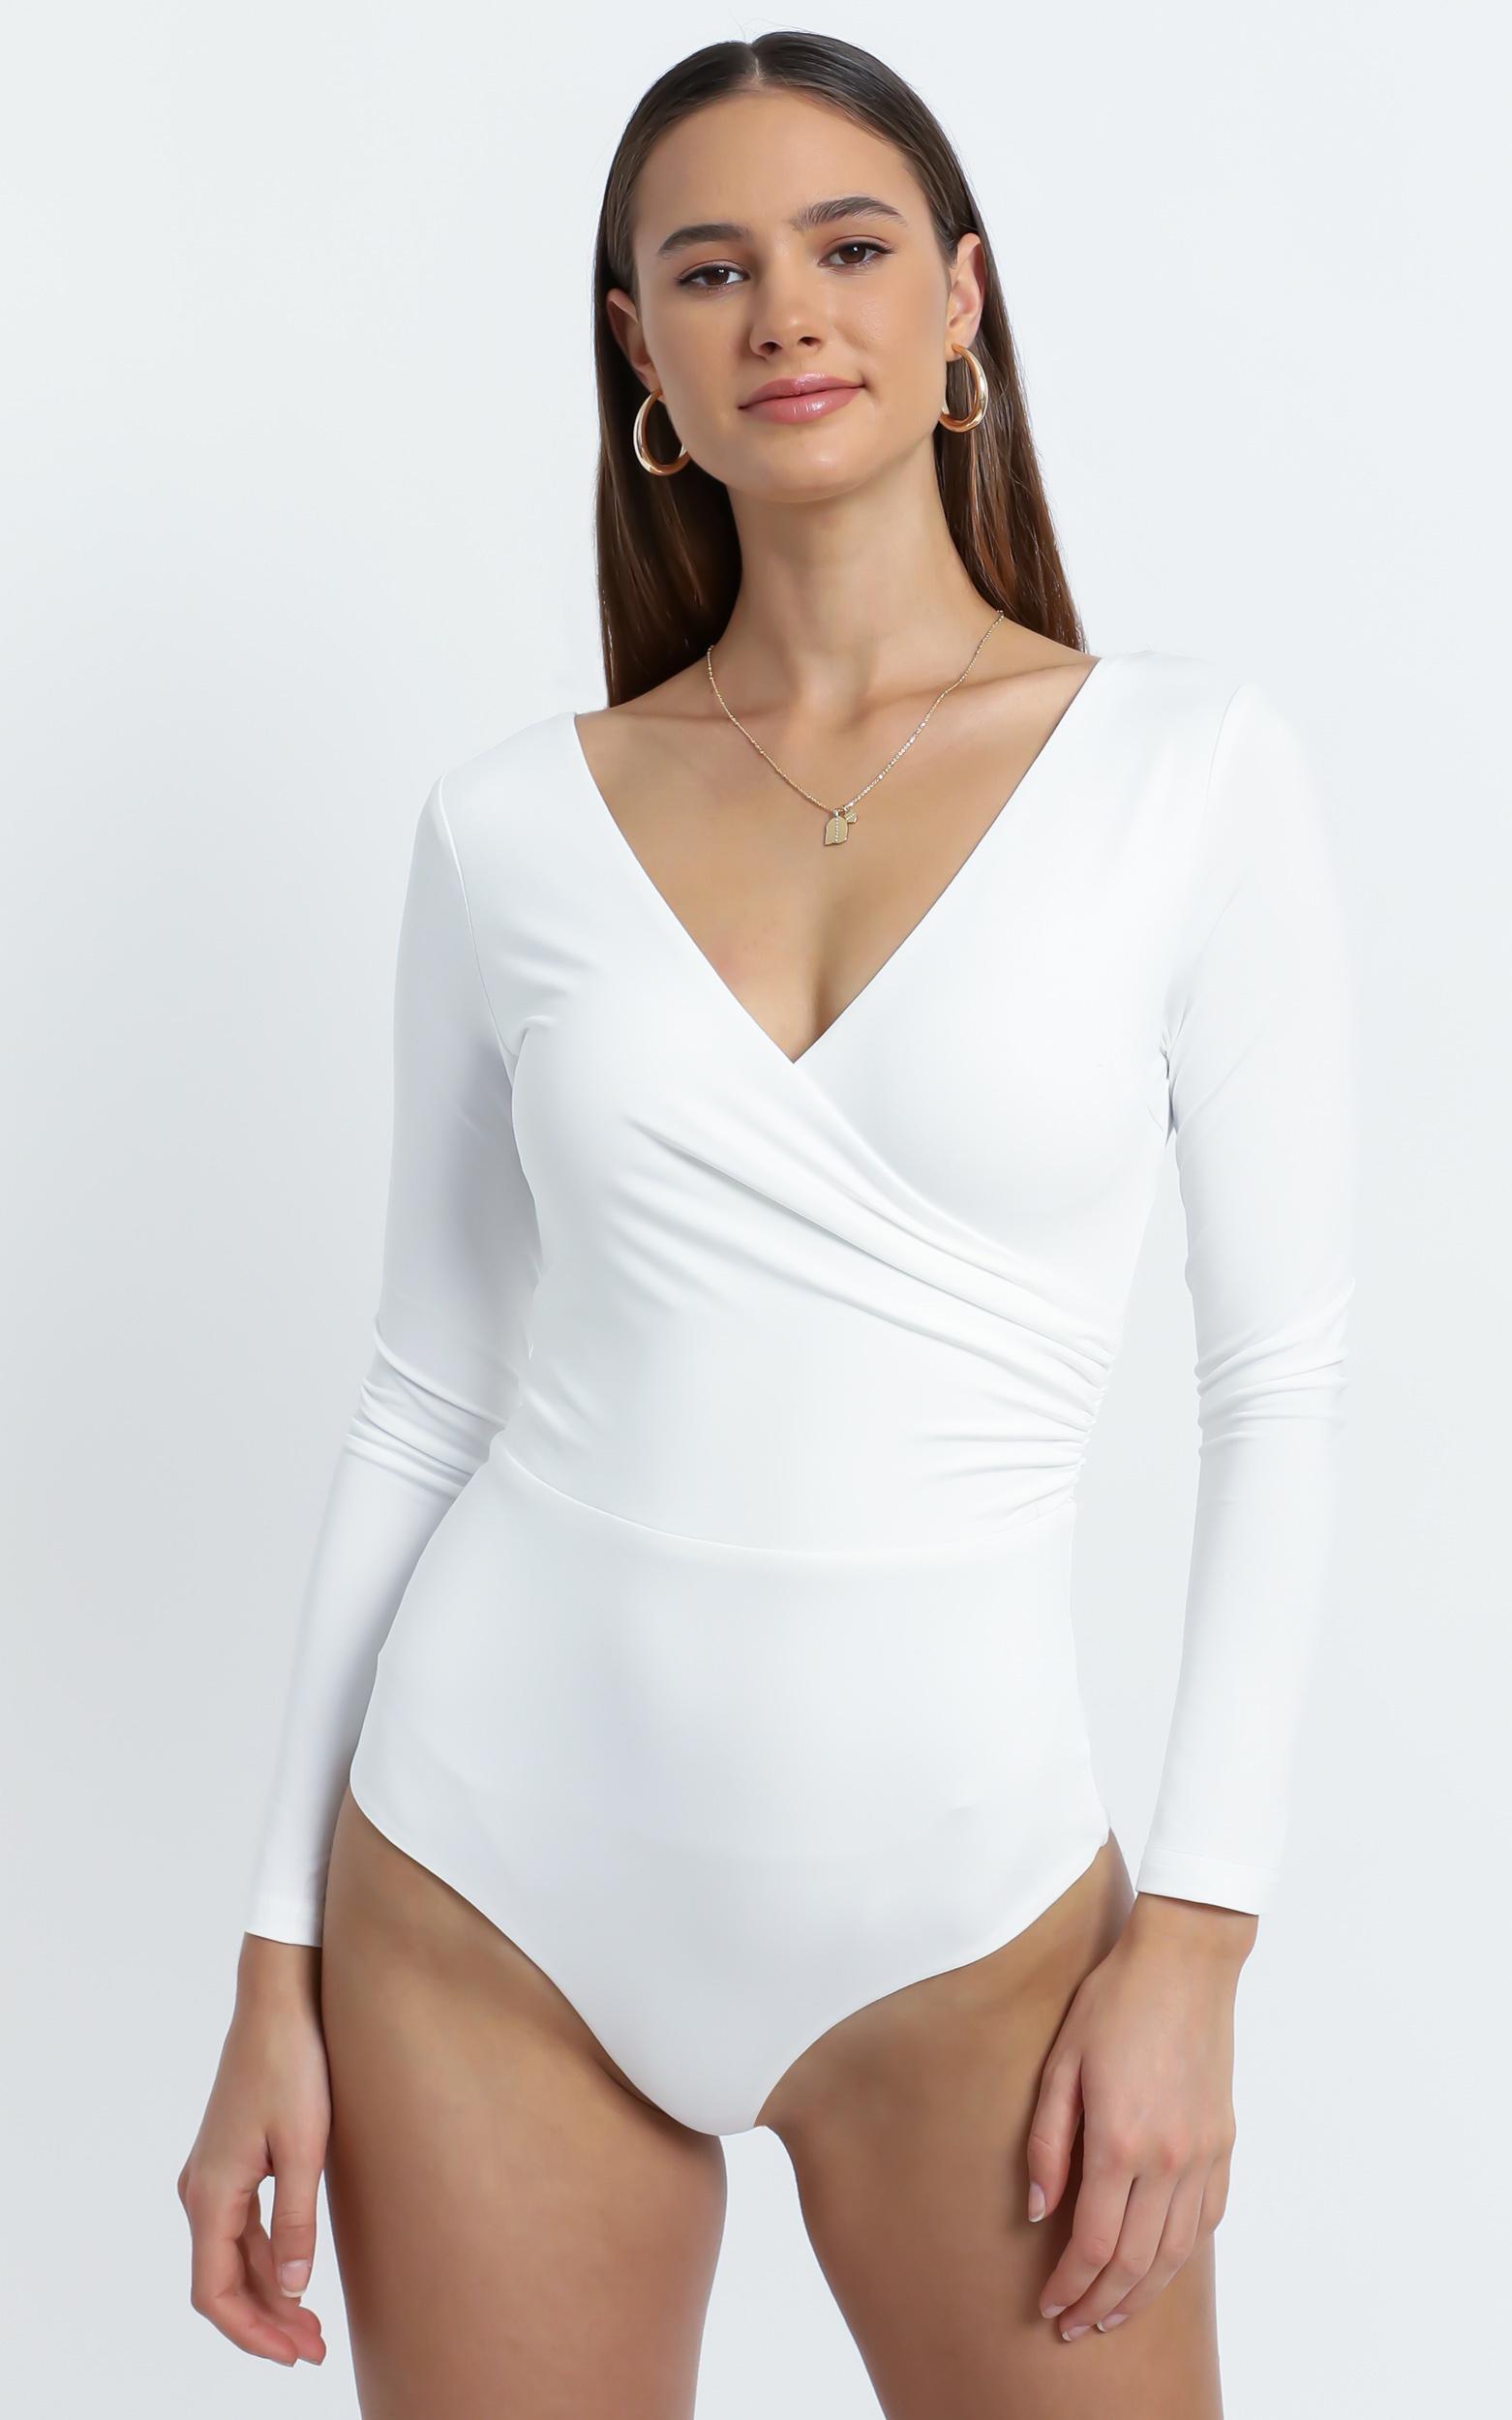 Kristina Longsleeve Bodysuit in White - 6 (XS), White, hi-res image number null